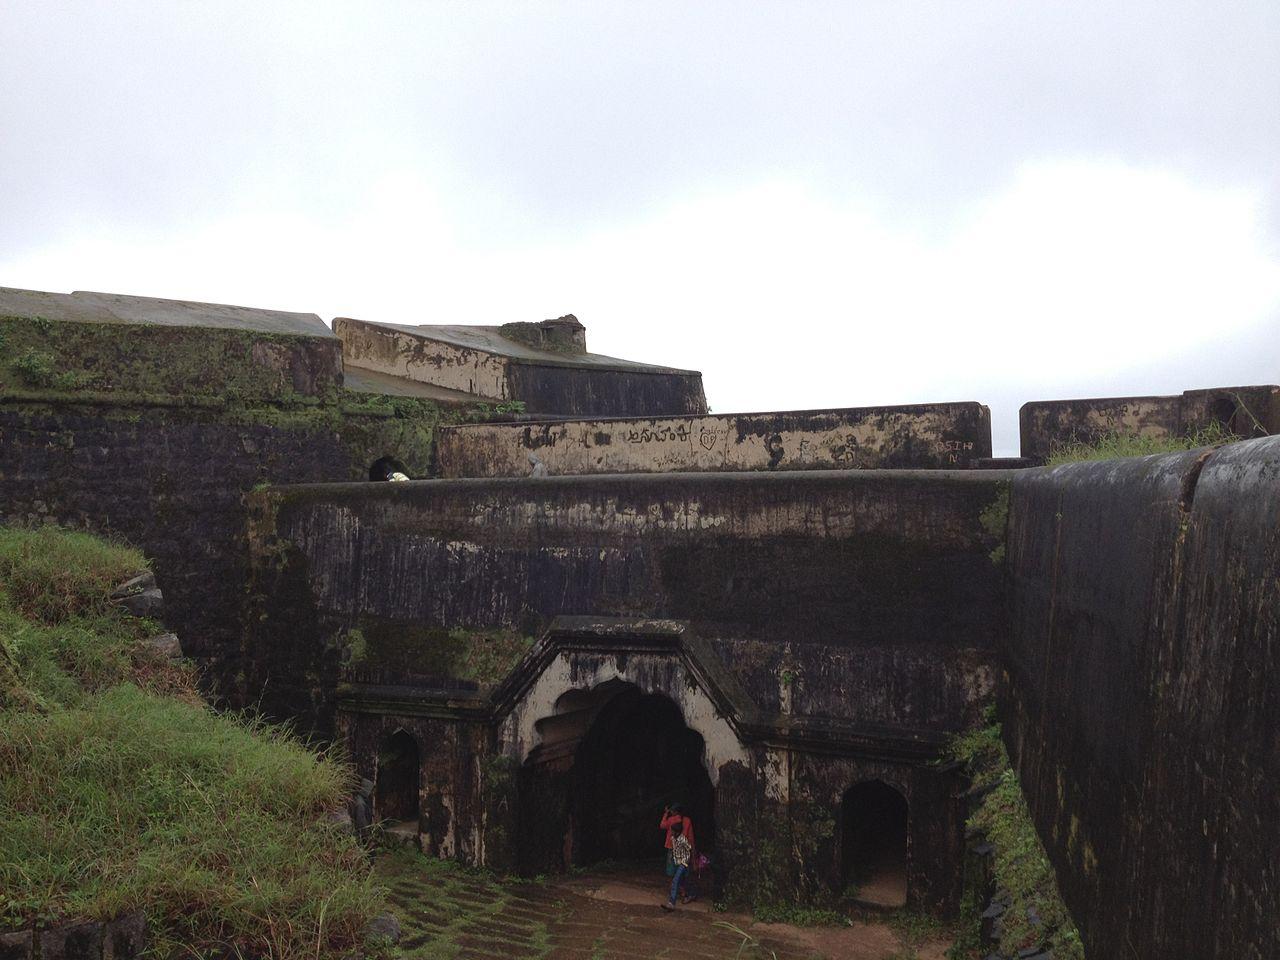 Manjarabad Fort-Historical Significance